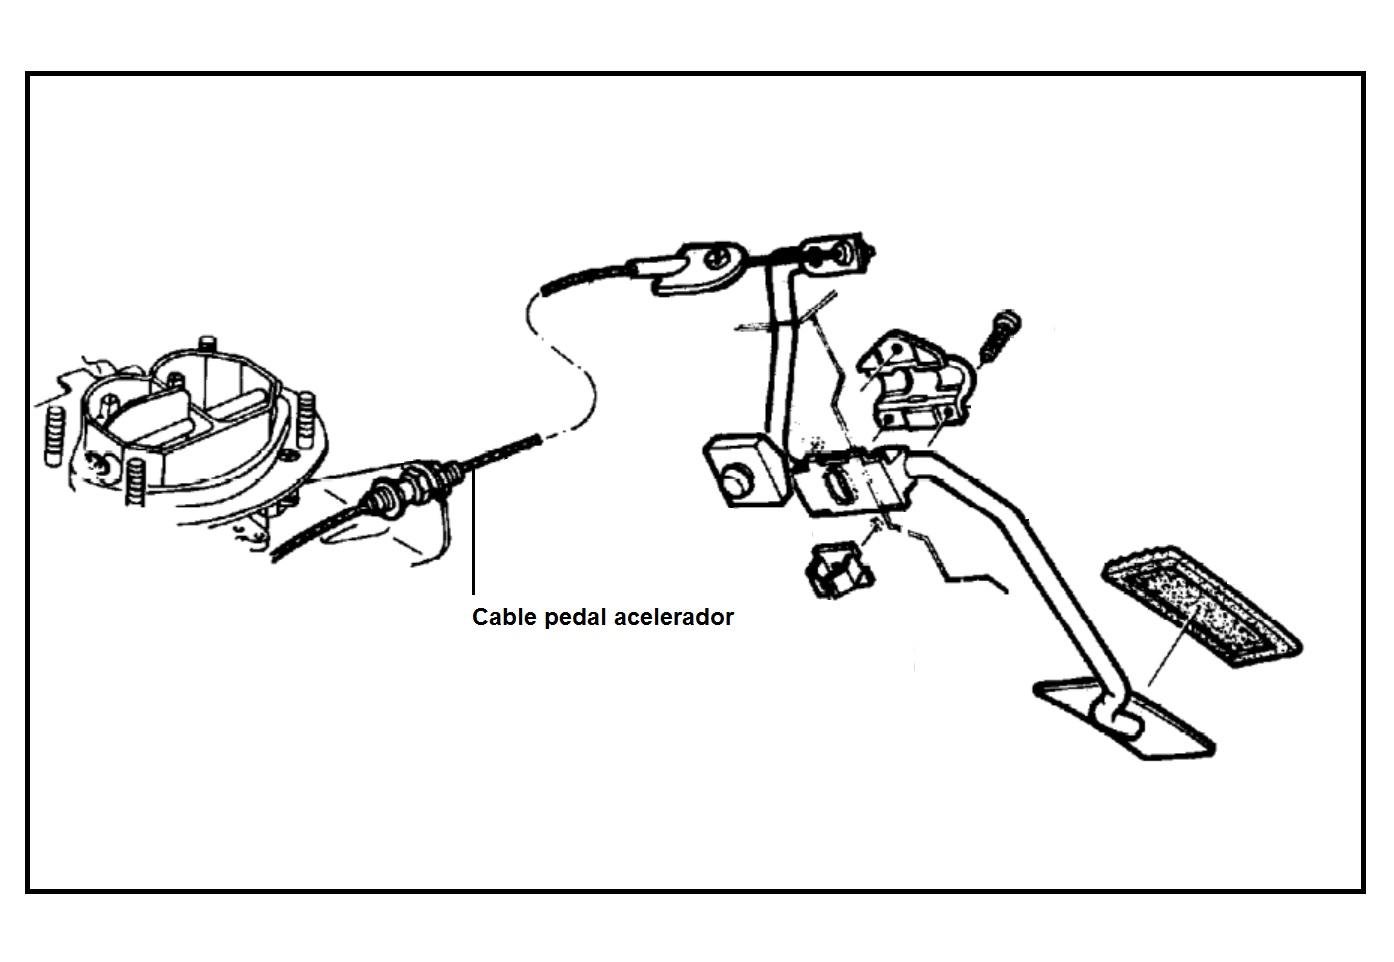 Cable Guaya Pedal Acelerador Para Chevrolet Chevette